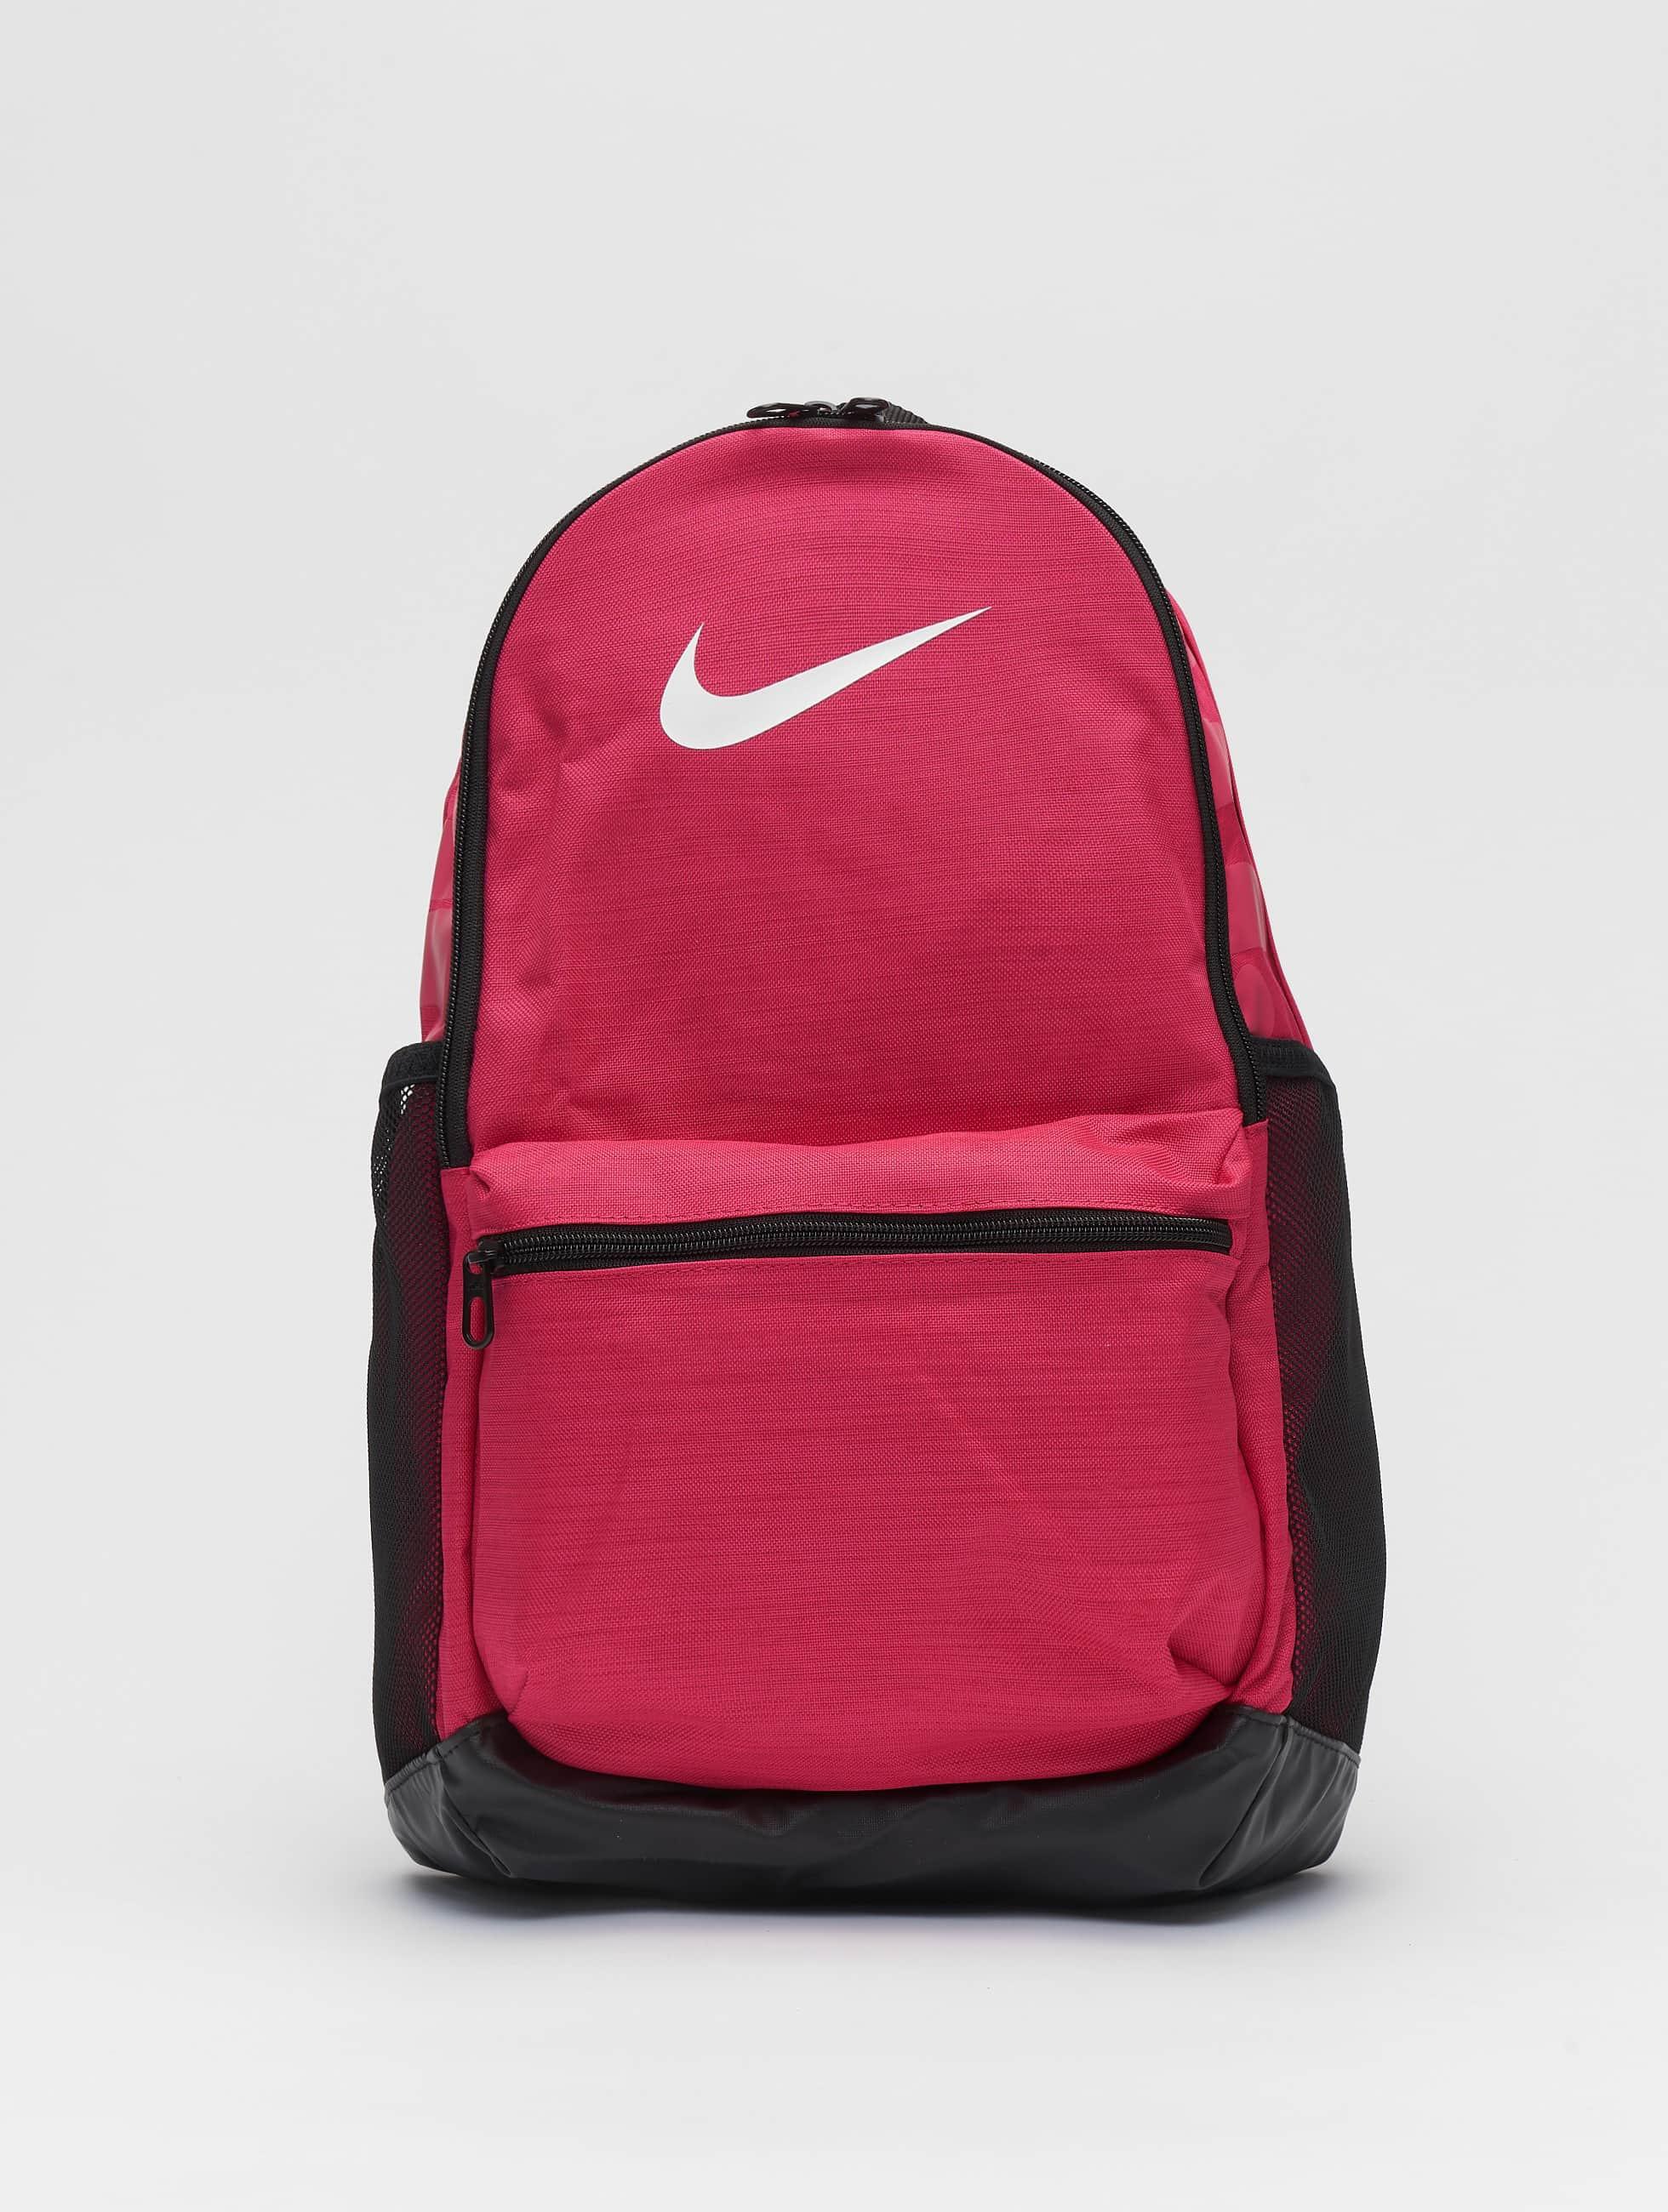 Nike Brasilia 9.0 (24l) Backpack BlackBlackWhite